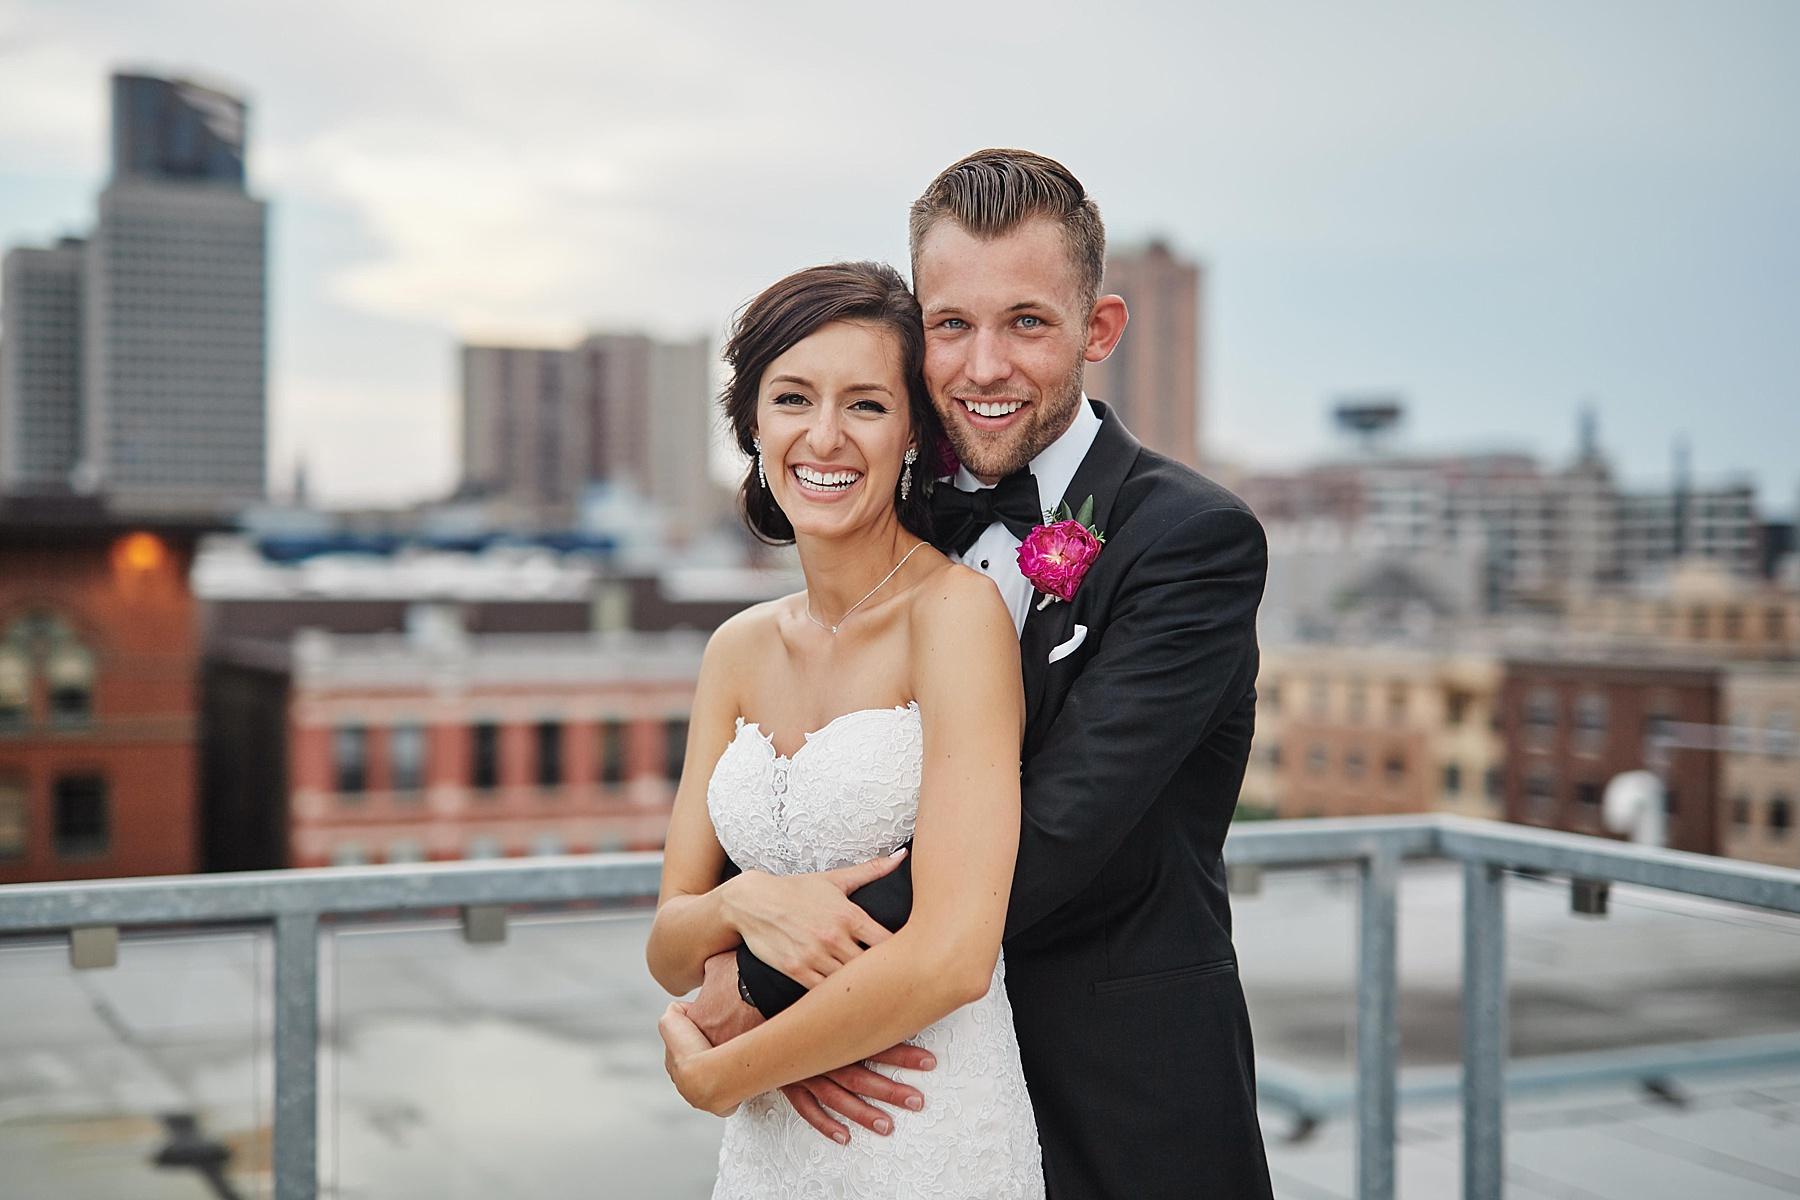 ABULAE-Wedding-Saint-paul-MN-Josh-Sofia-Wedding-Mears-Park_0821.jpg